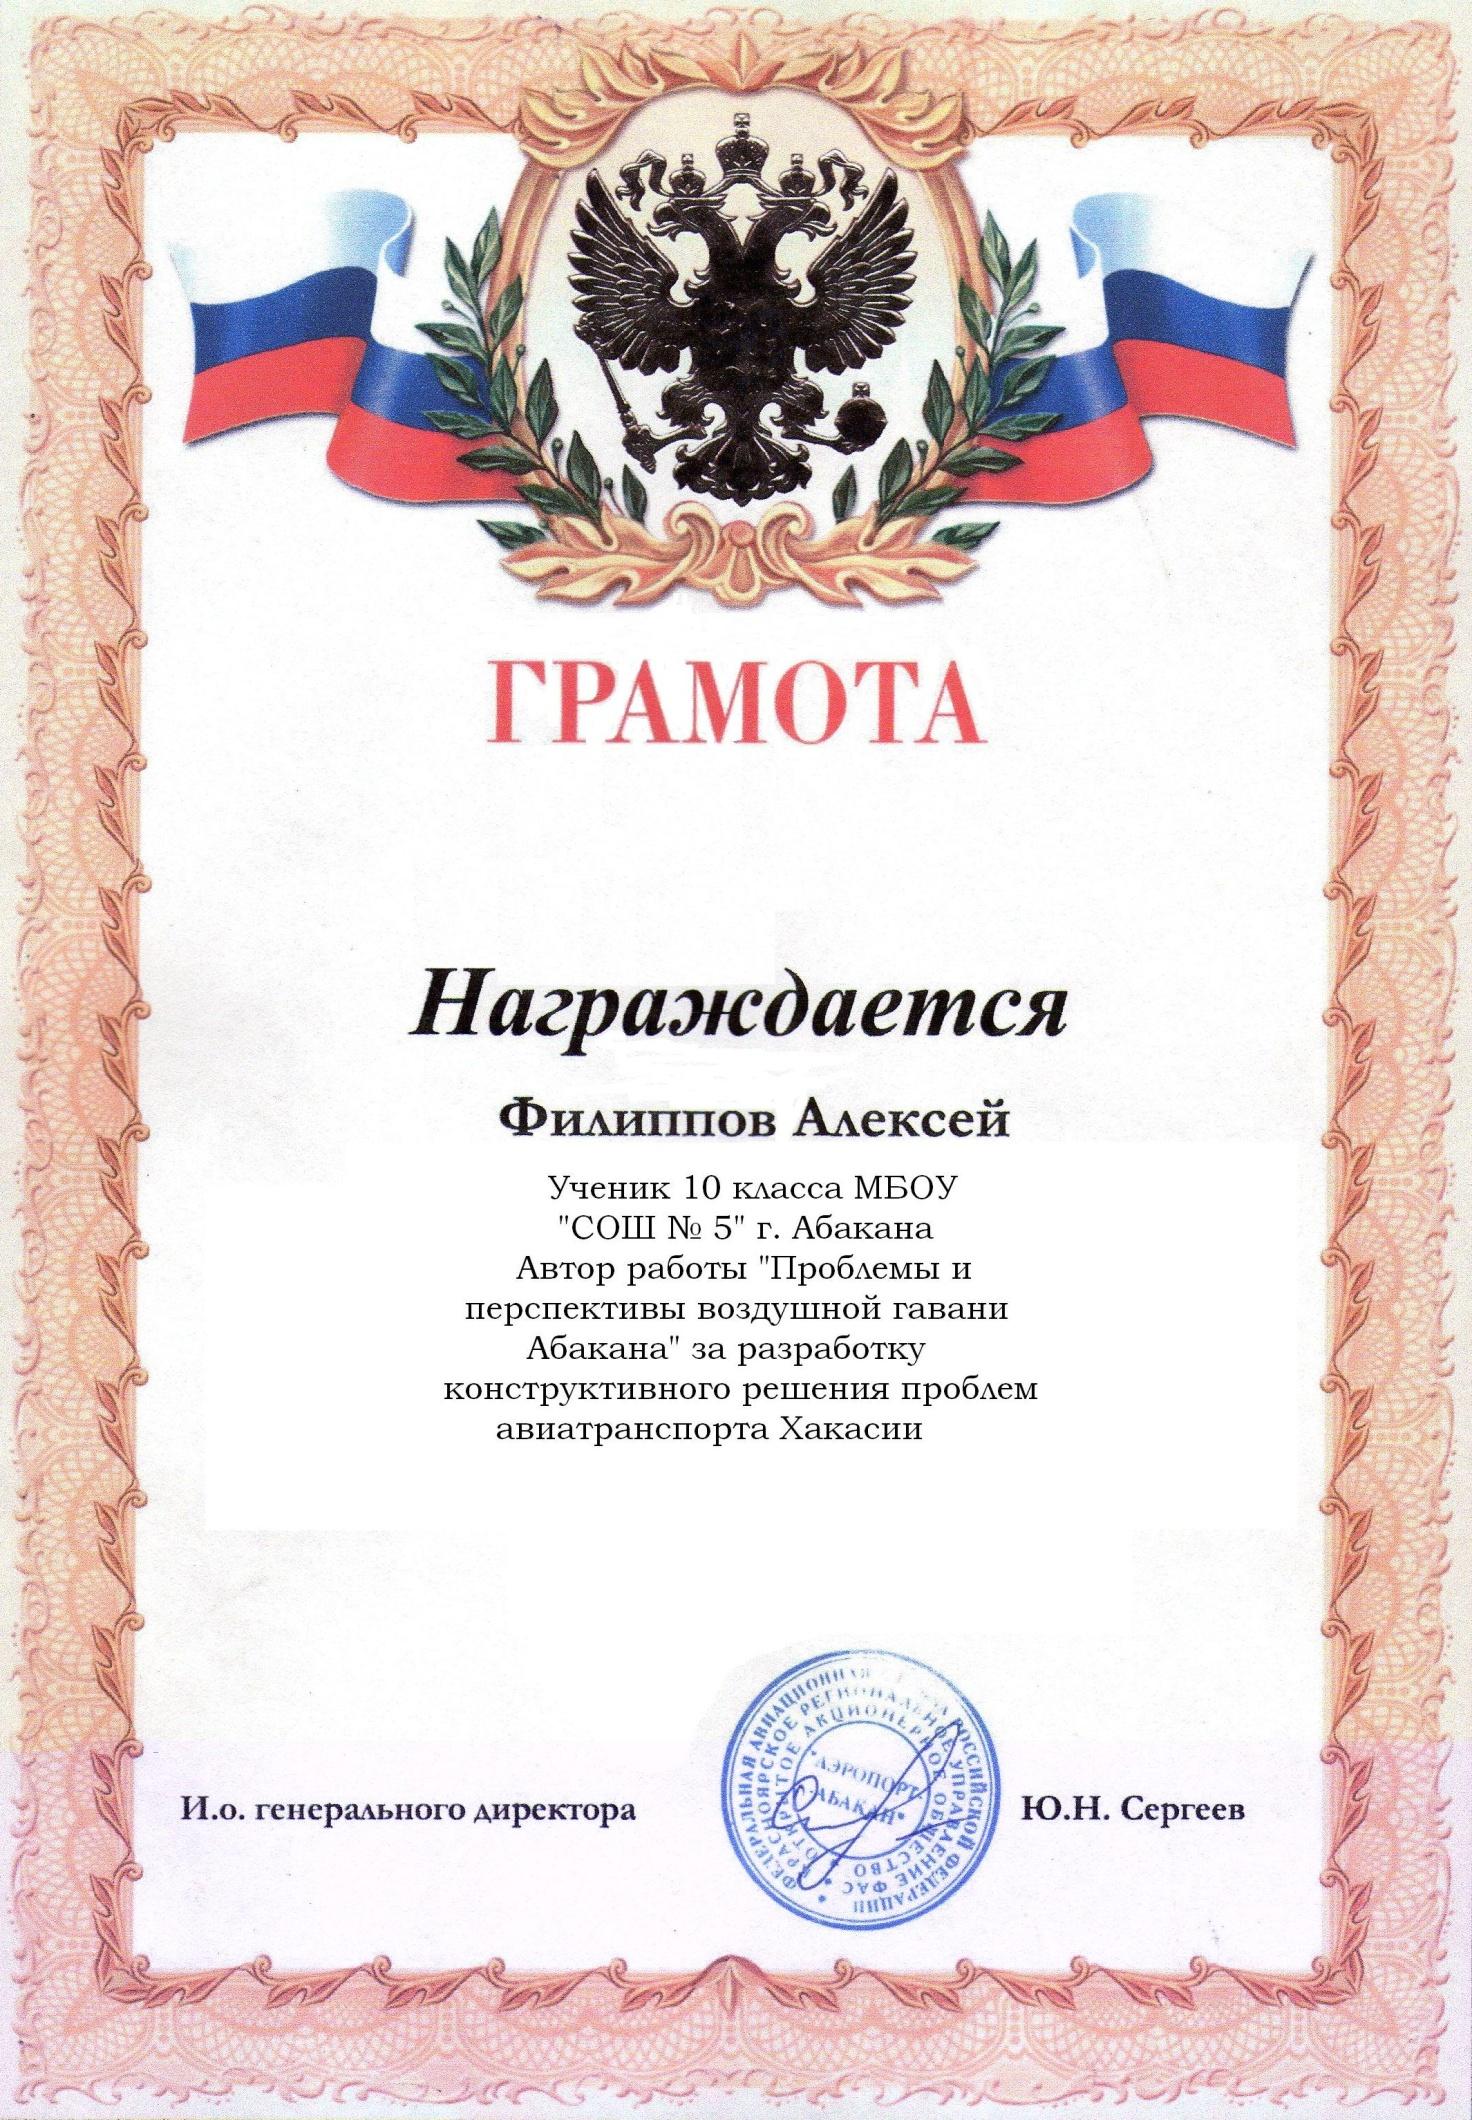 C:\Documents and Settings\user\Рабочий стол\Аэропорт.JPG